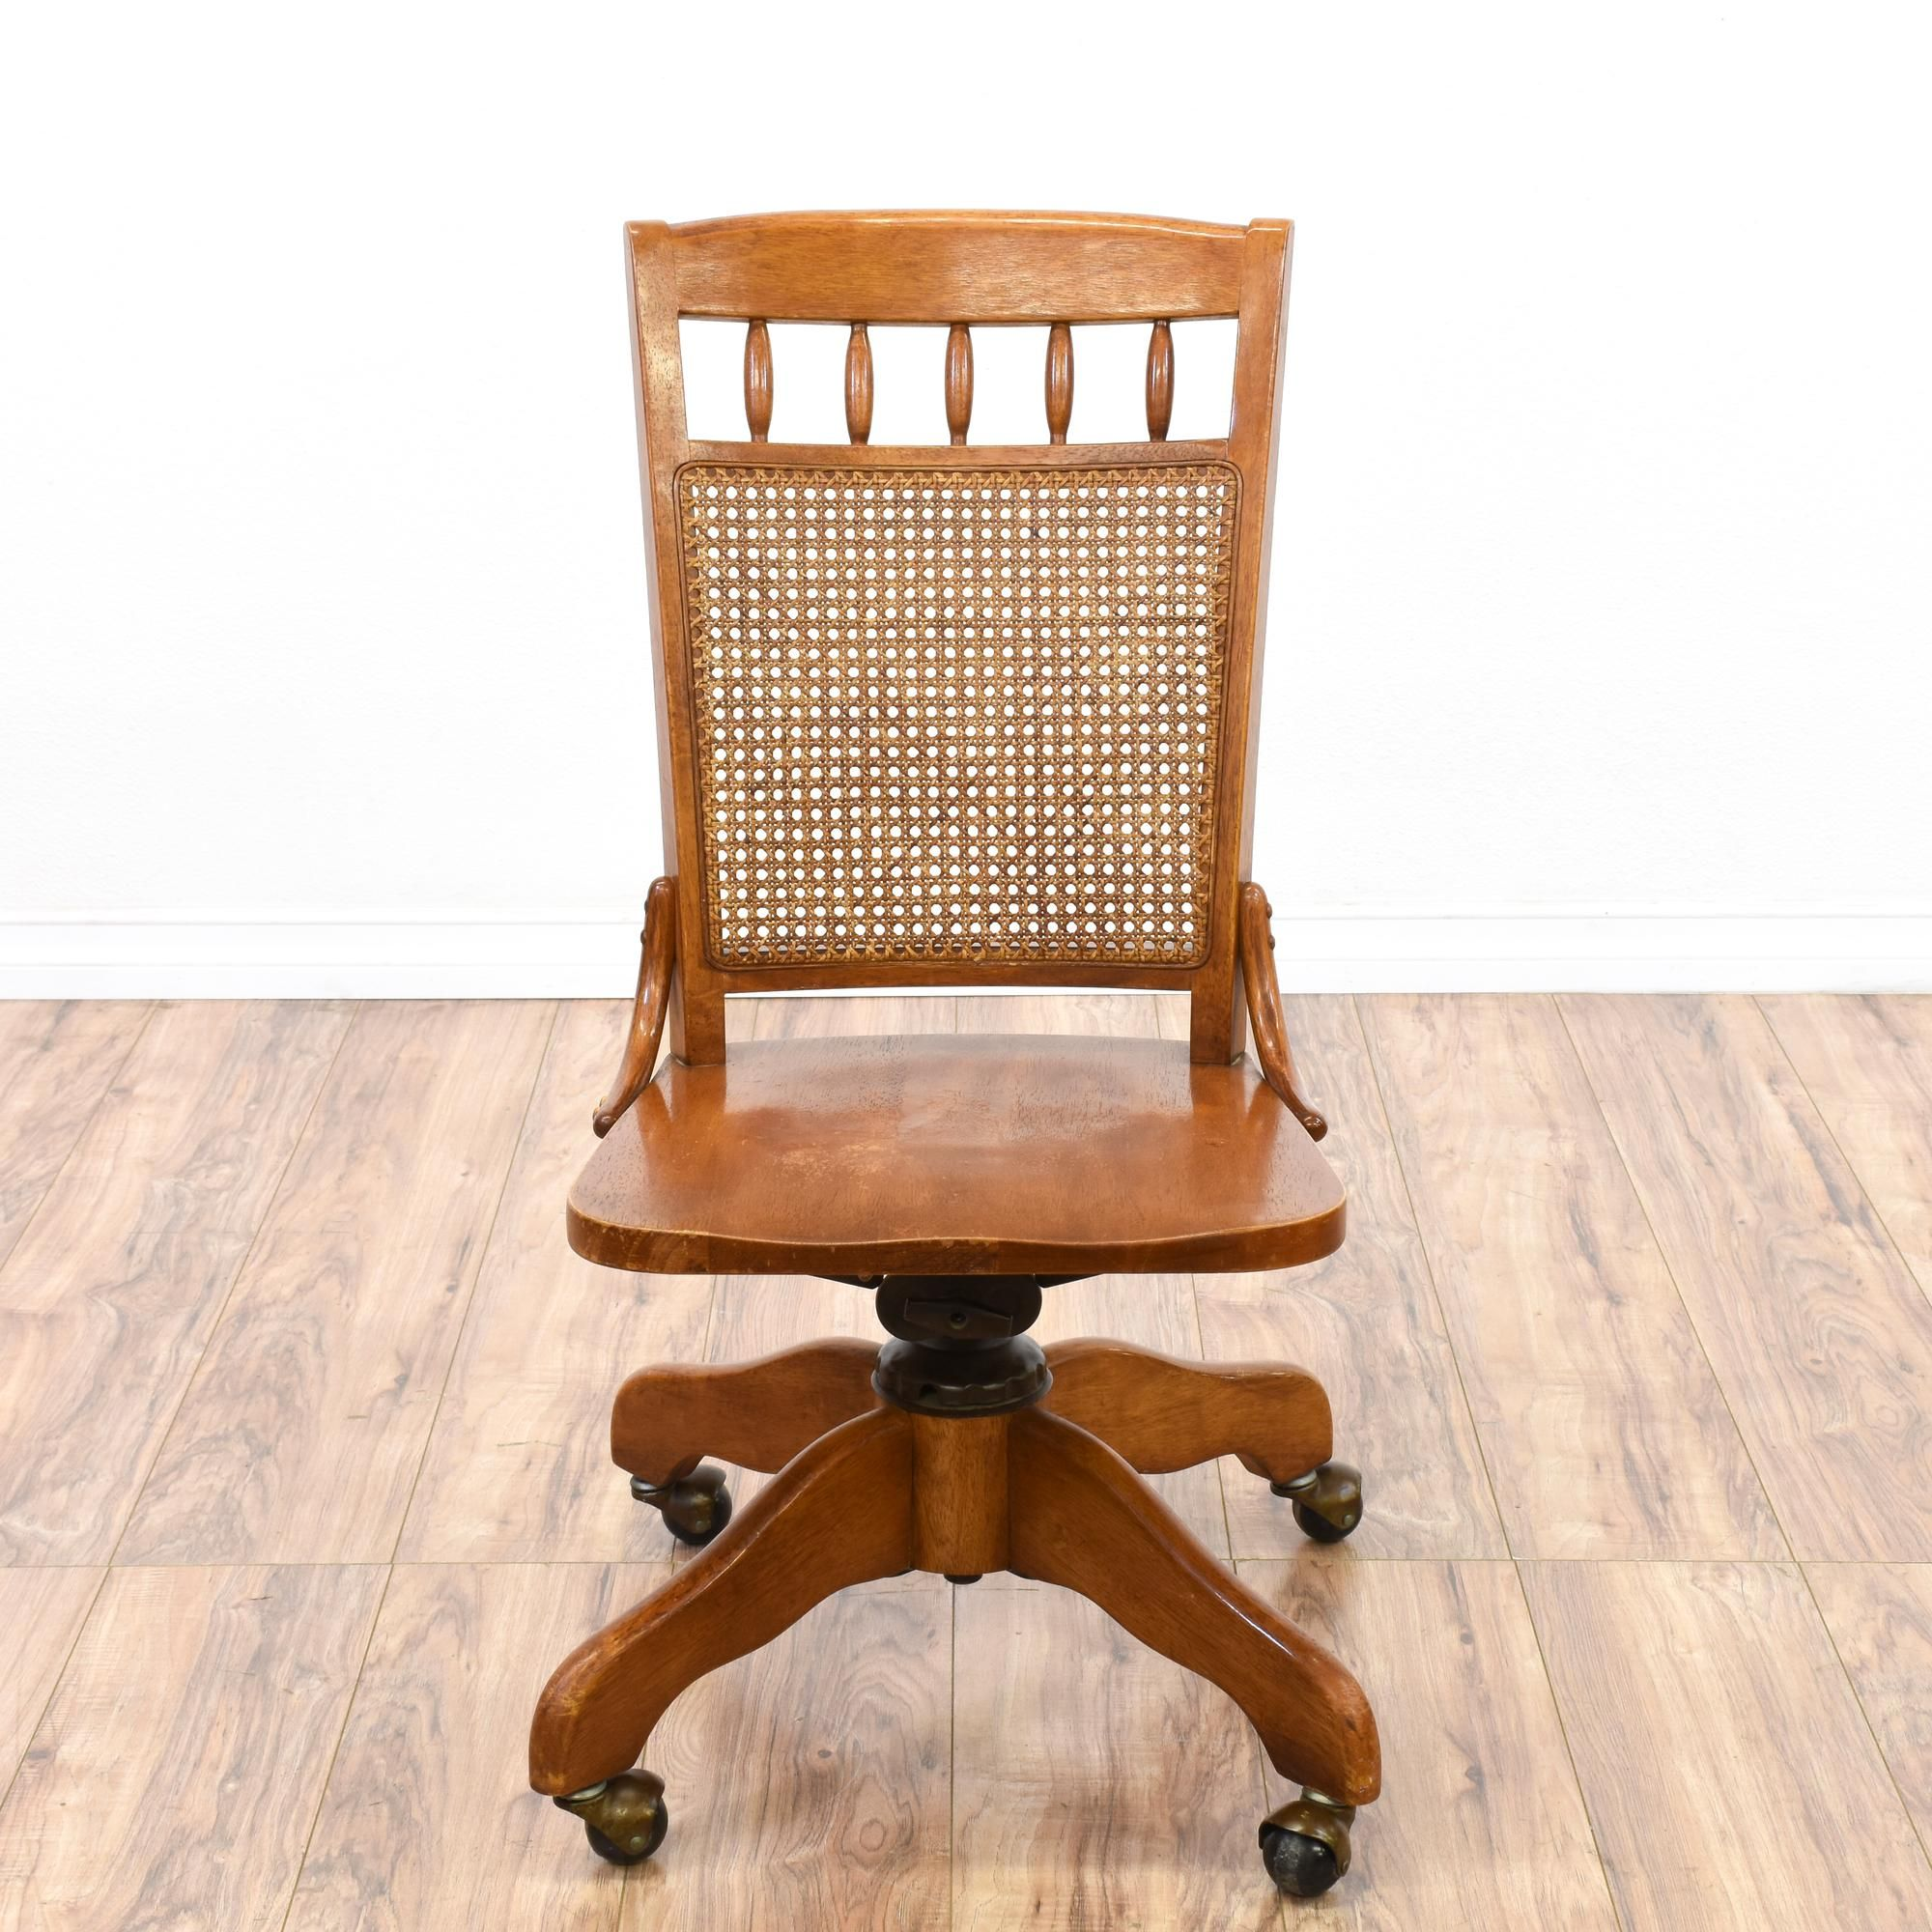 Cane Back Rolling Desk Chair Rolling desk chair, Desk chair